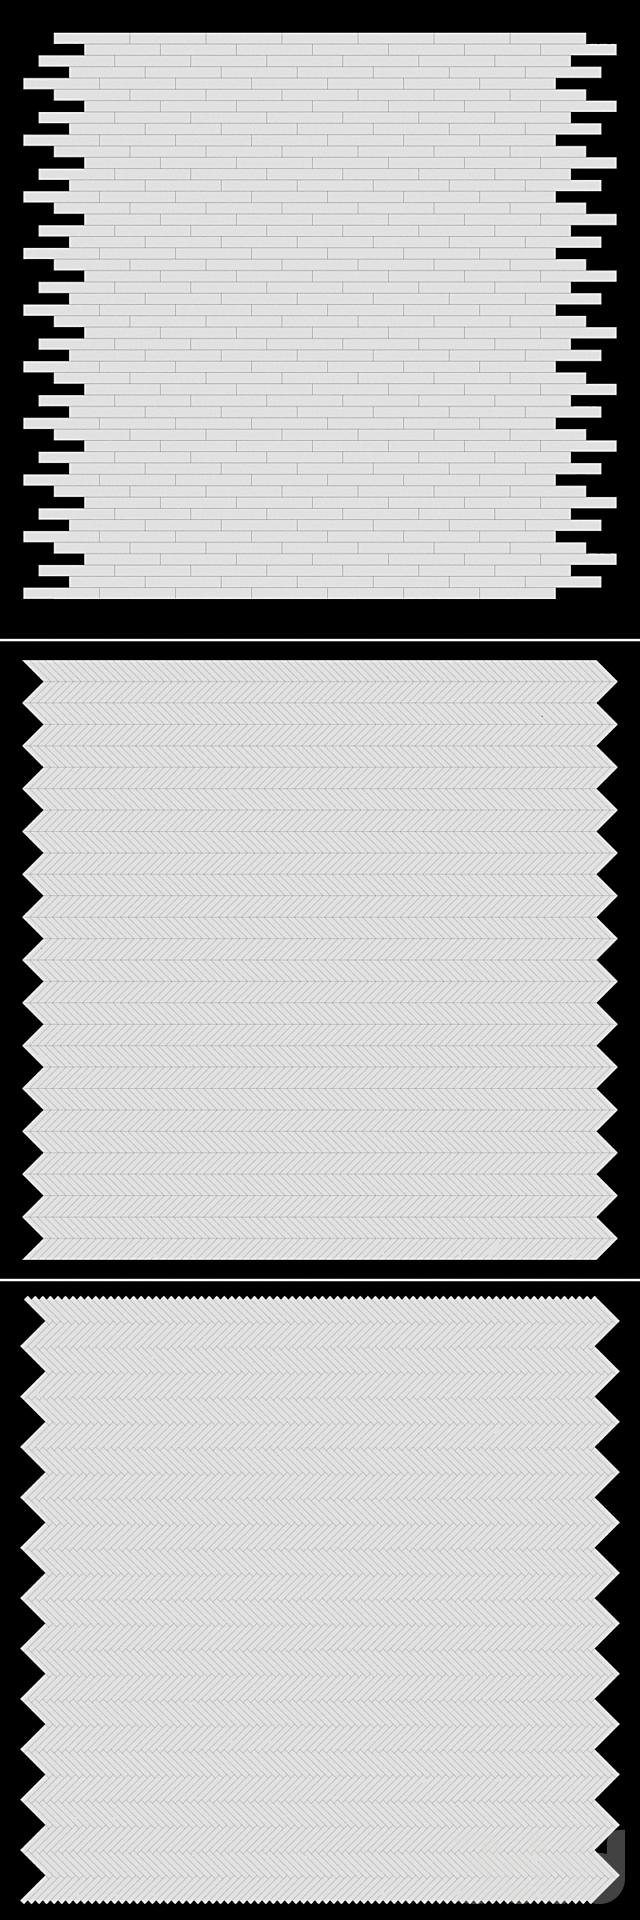 Паркет Дуб серый, 3 вида: елочка, линейный, шеврон.